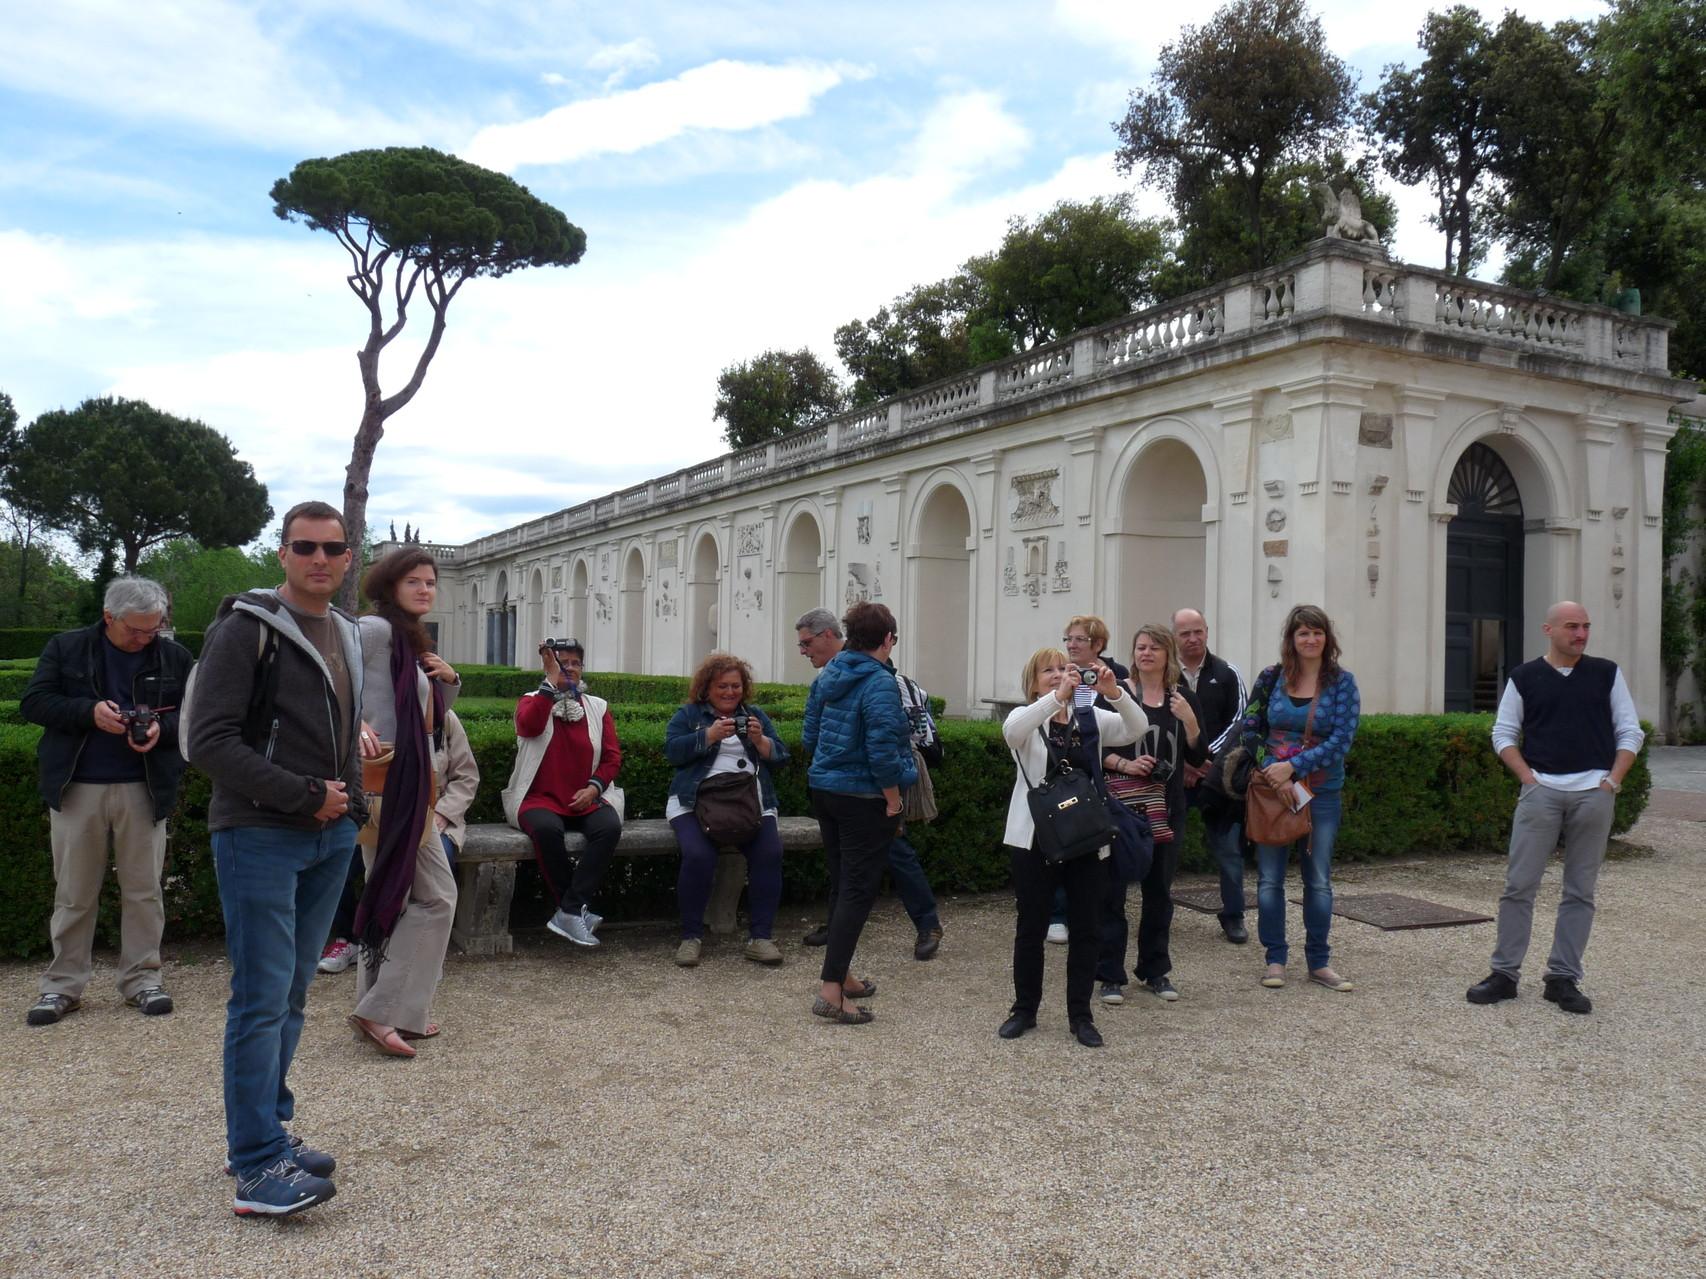 Devant la Villa Médicis à Rome